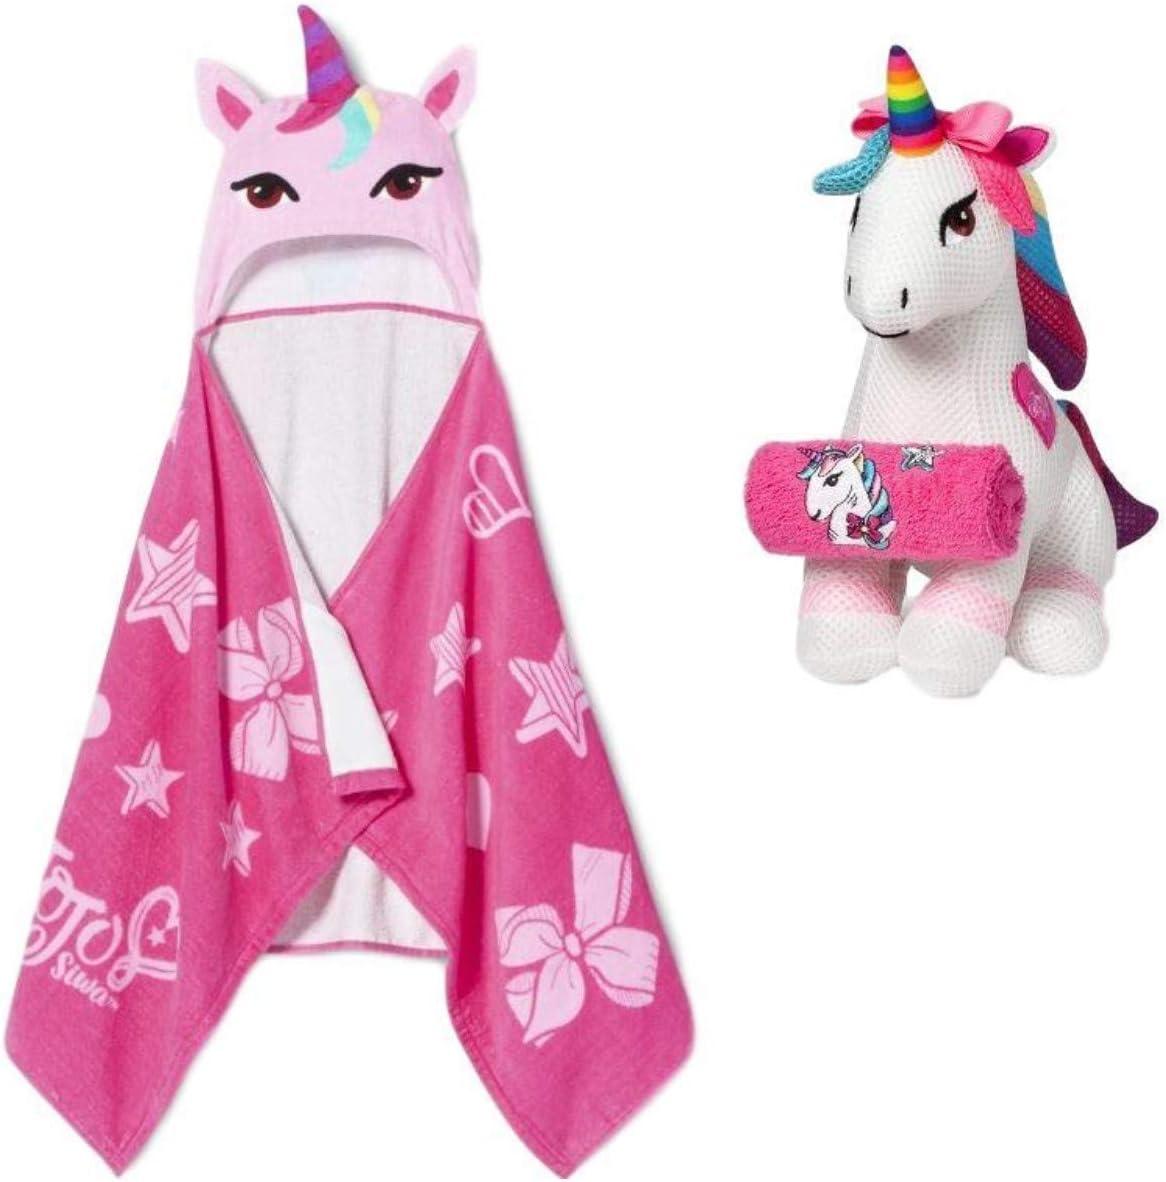 JoJo Siwa Unicorn Hooded Bath Towel